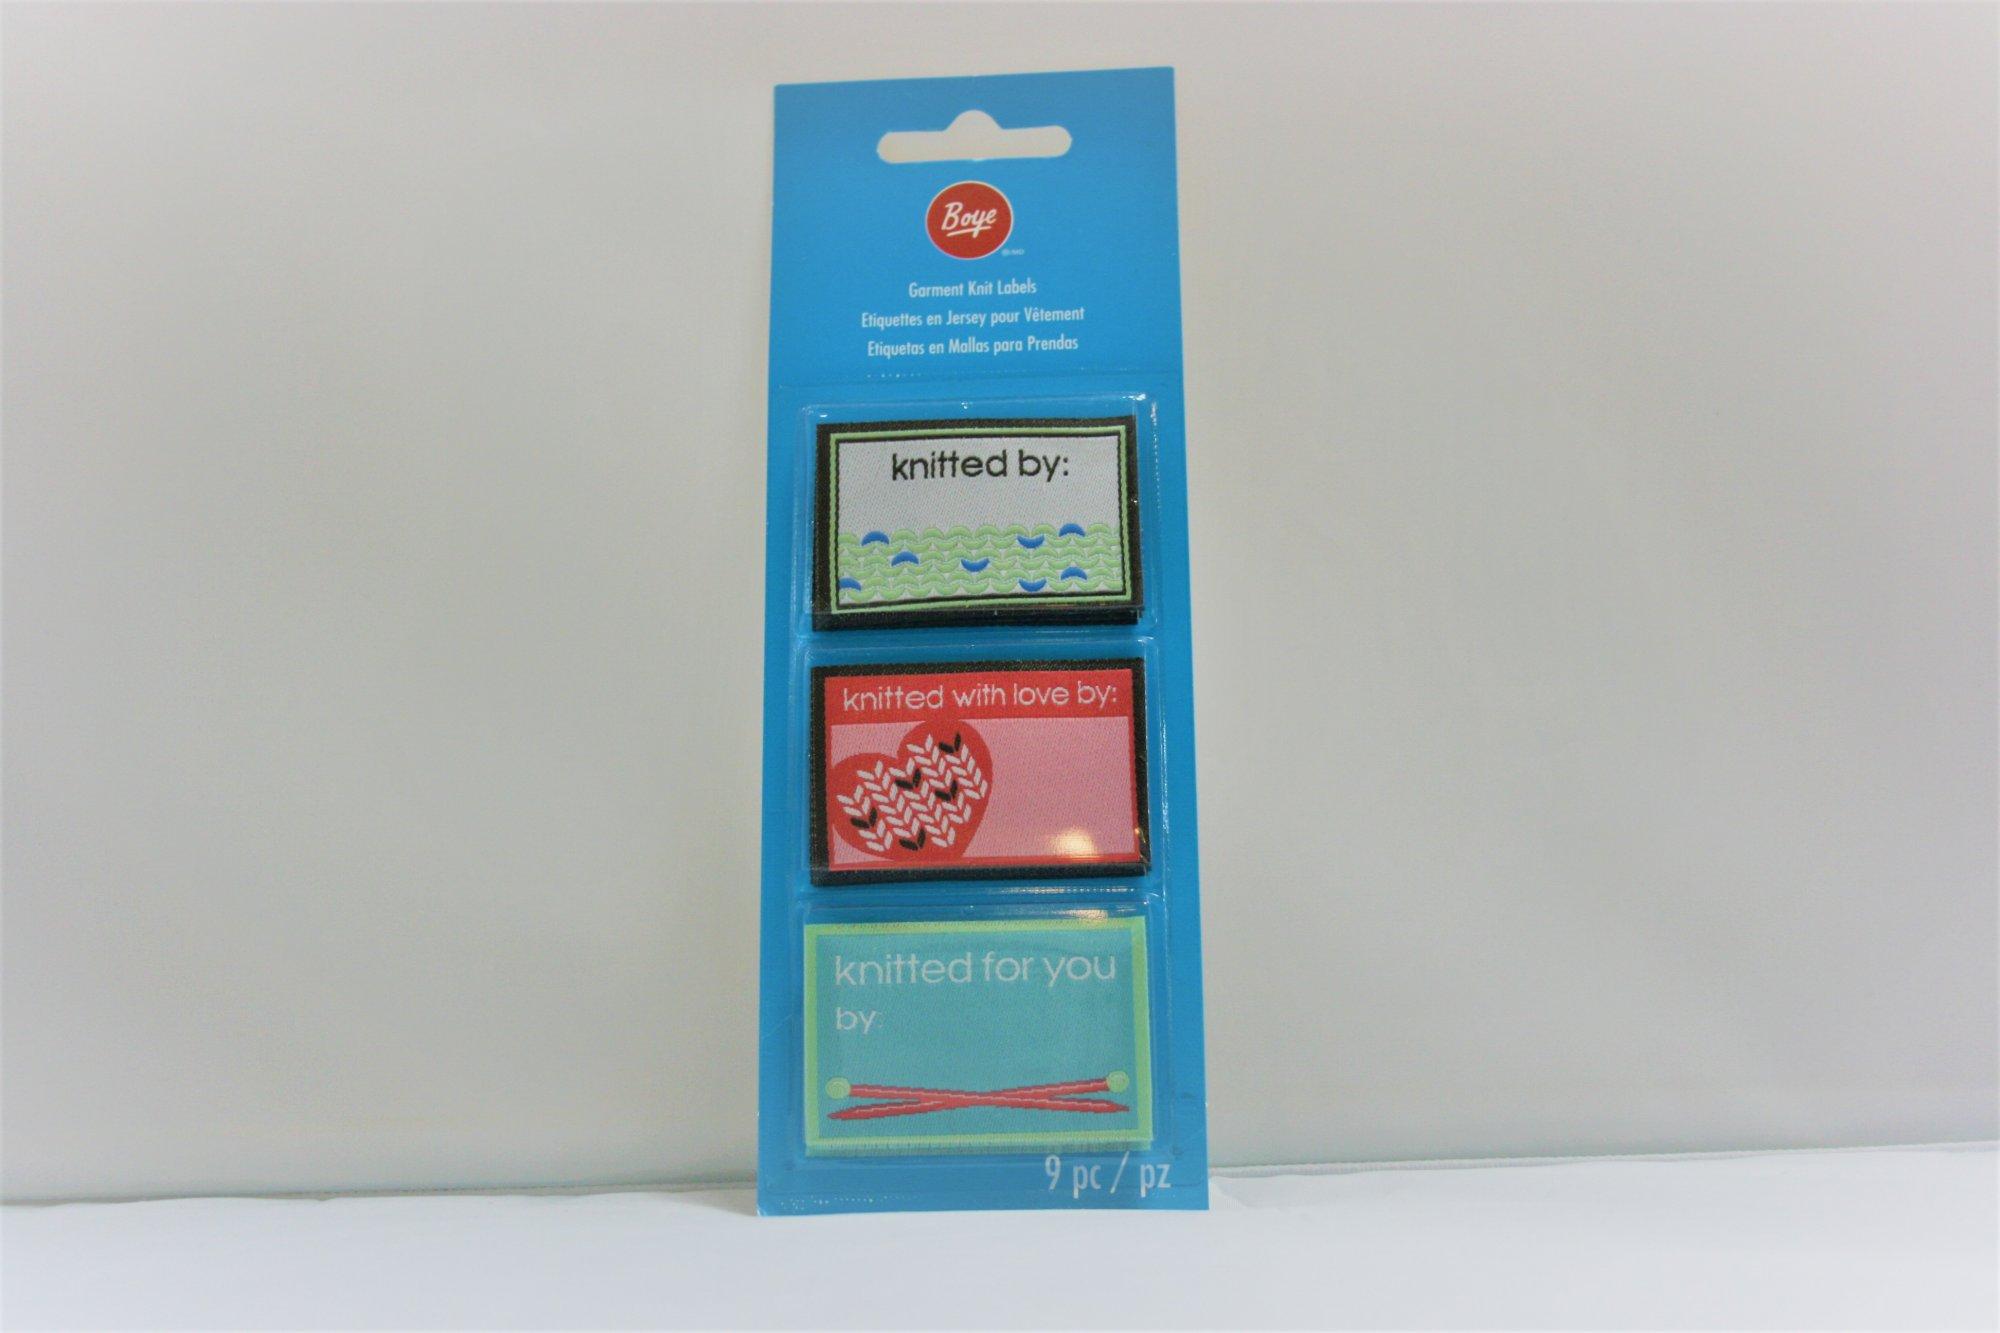 Boye Garmet Labels